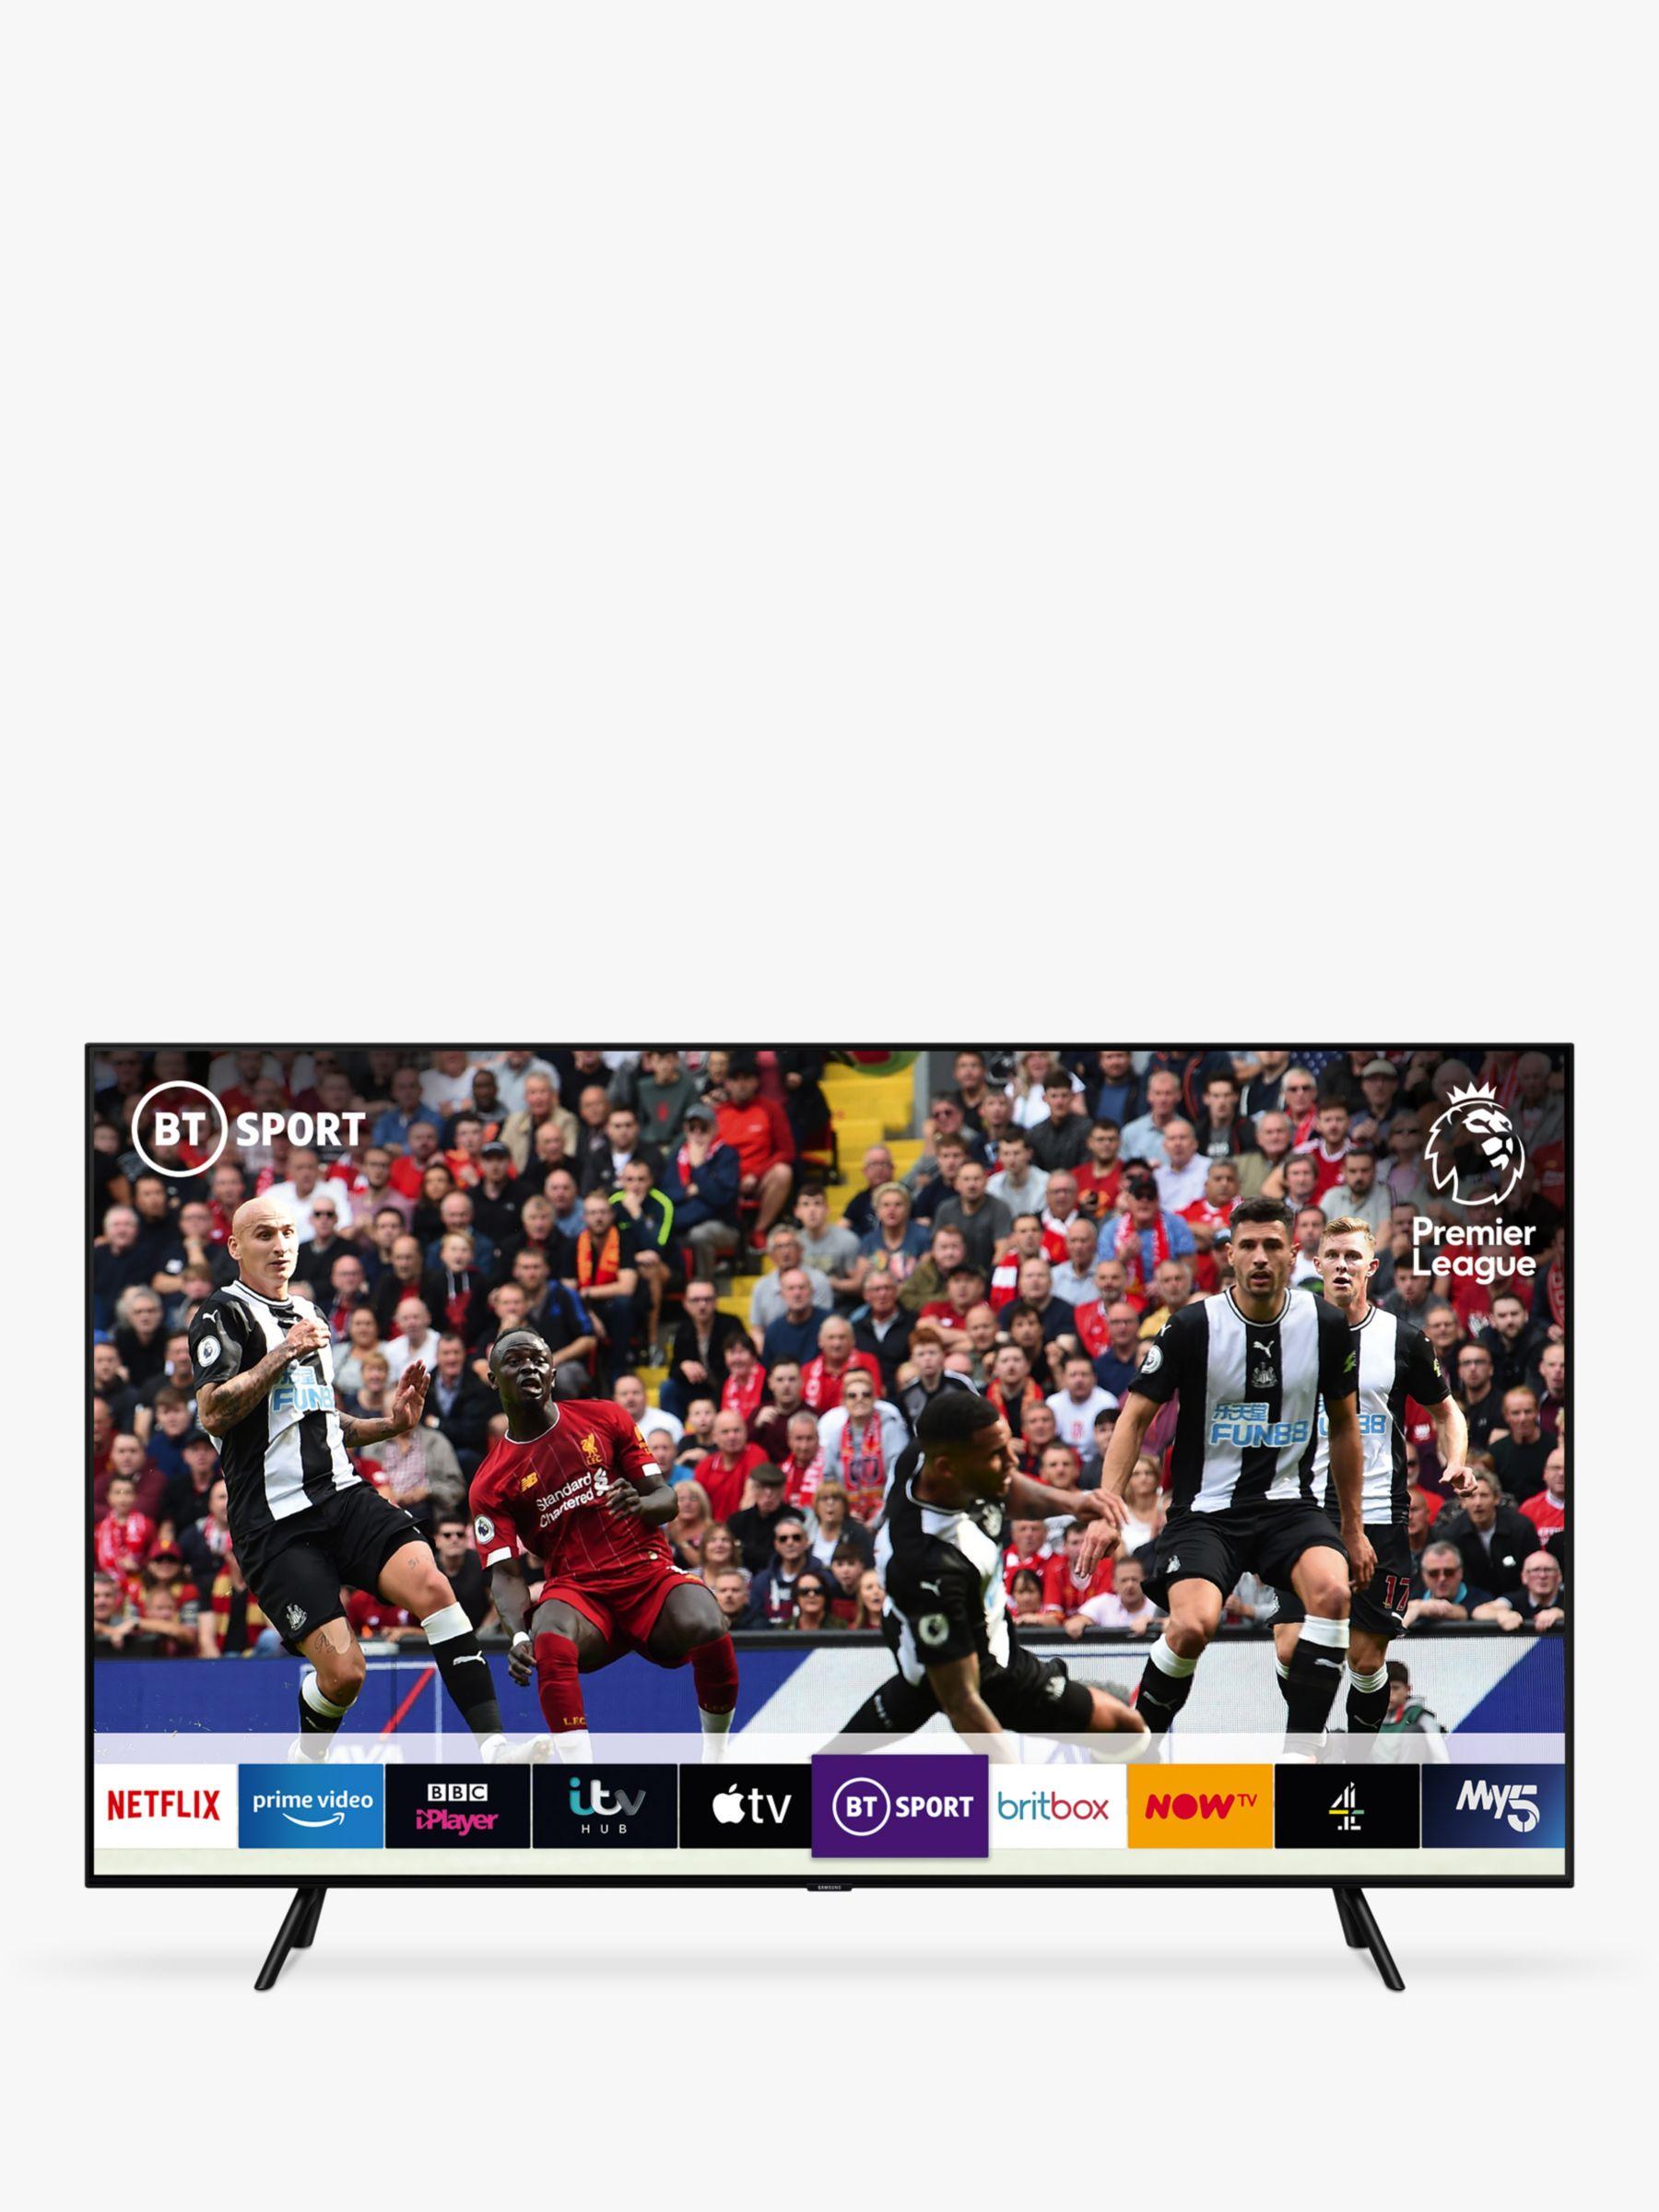 Samsung QE65Q70R (2019) QLED HDR 1000 4K Ultra HD Smart TV, 65